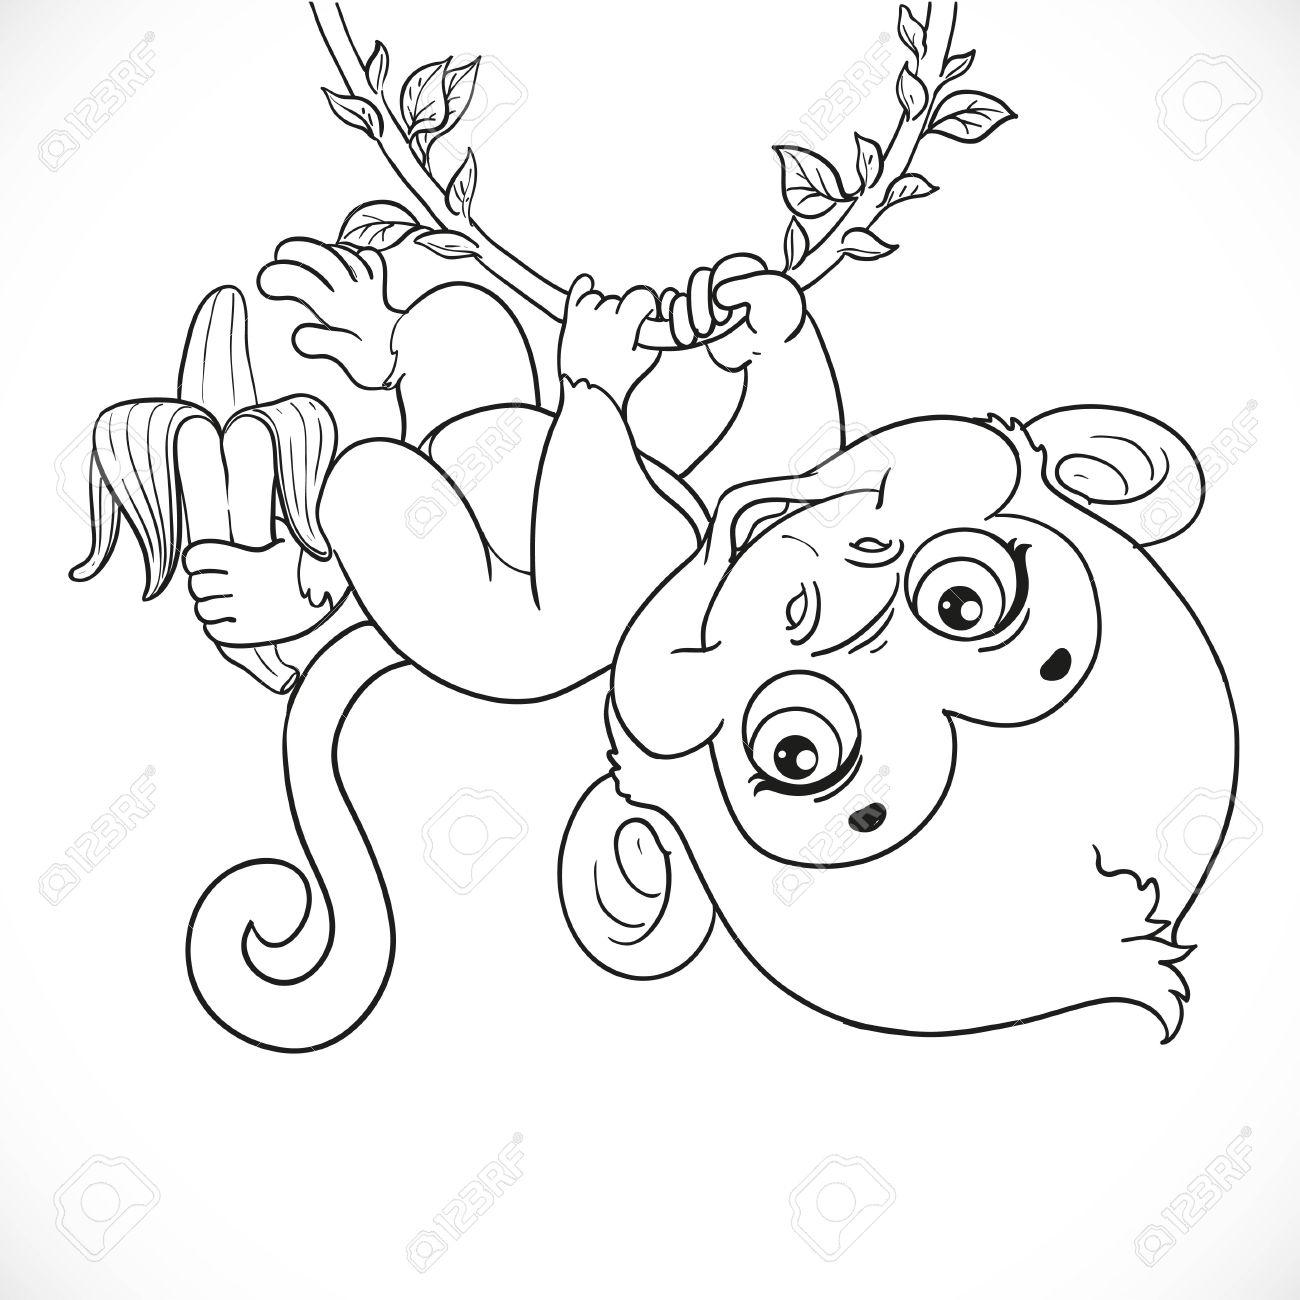 1300x1300 Cute Baby Monkey Drawings Baby Monkey Cartoon Clip Art Baby